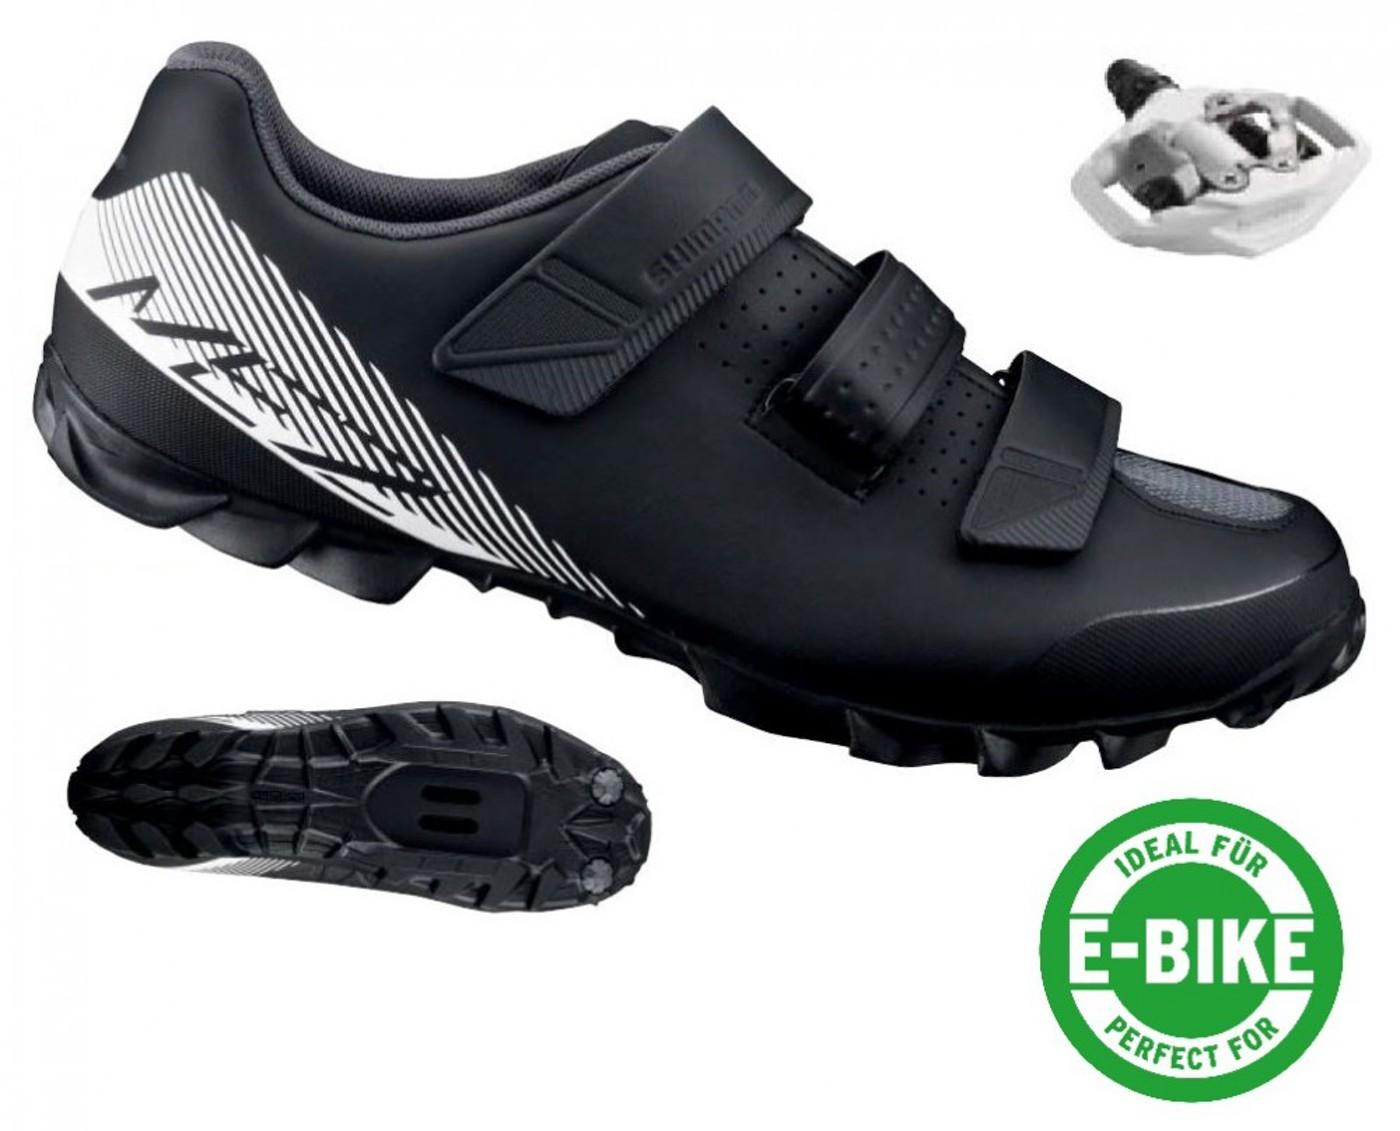 SHIMANO MTB-Schuh ME 200 L - Damen